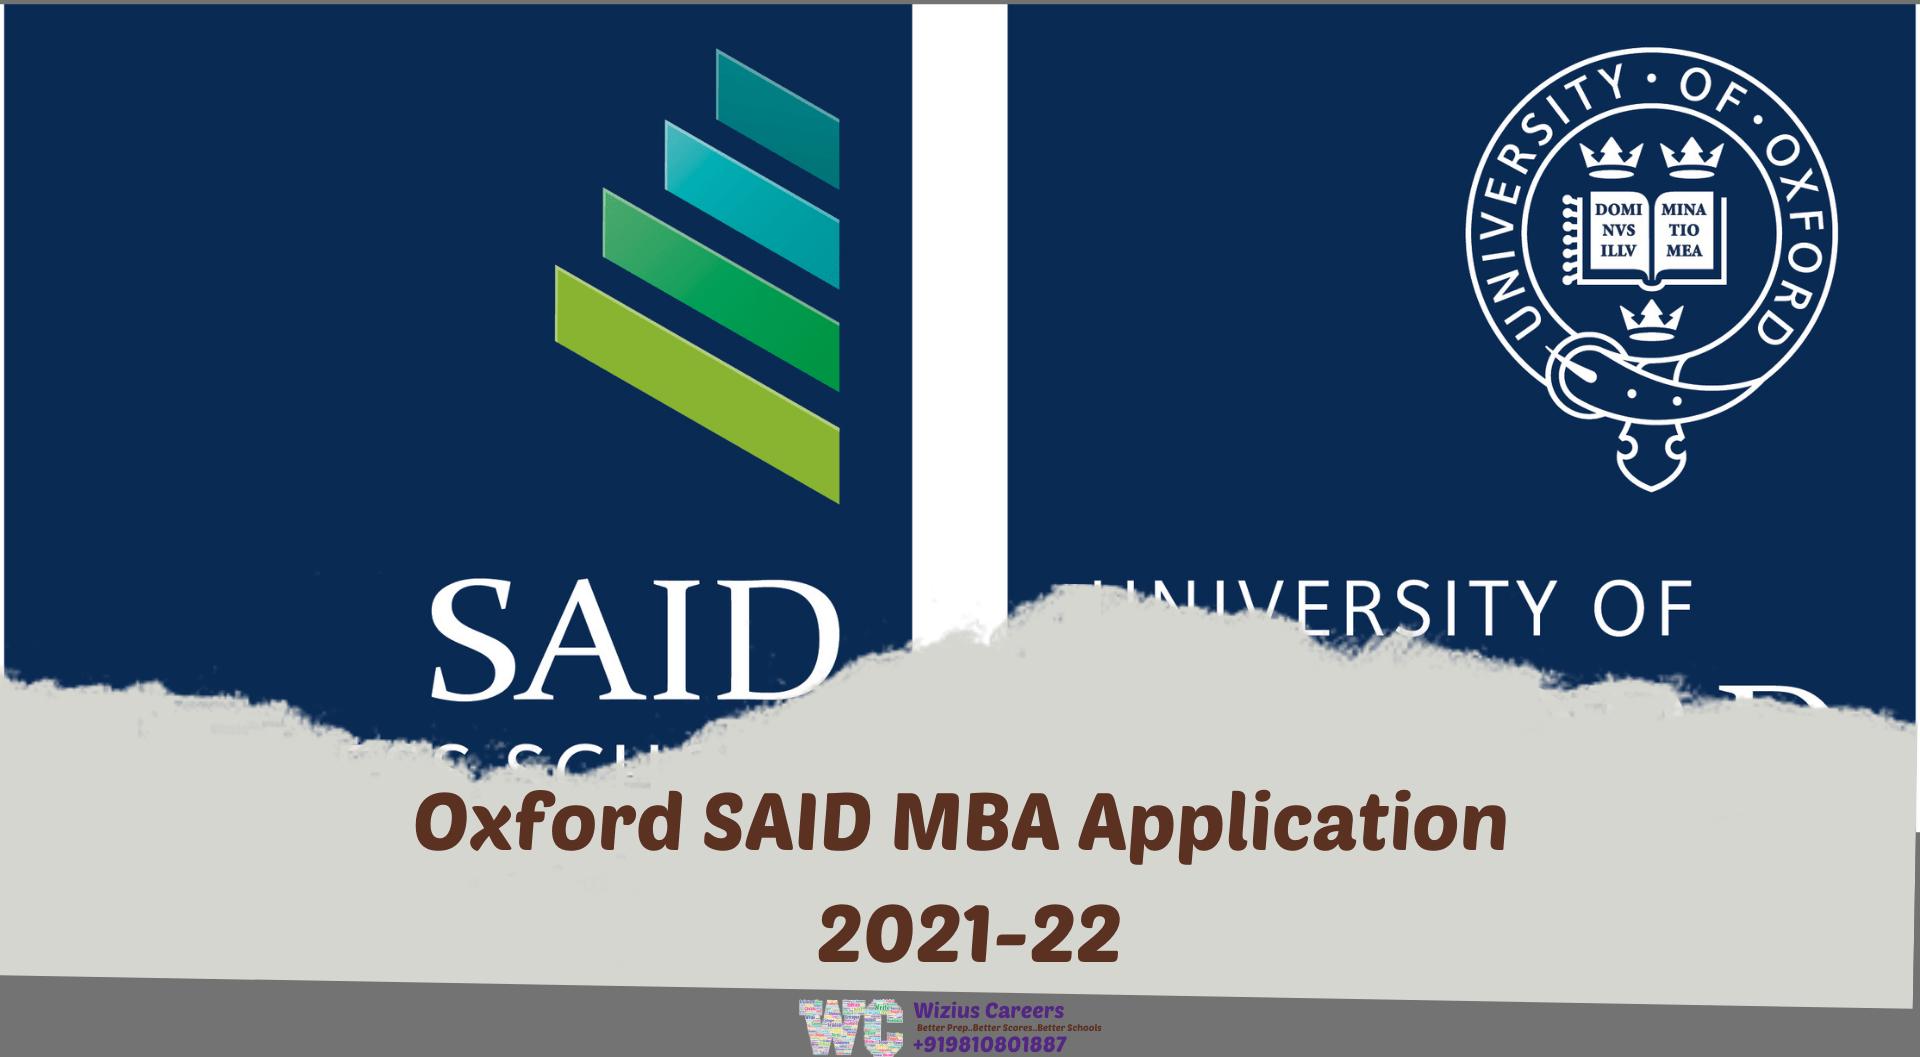 Oxford Said MBA Application 2021-22